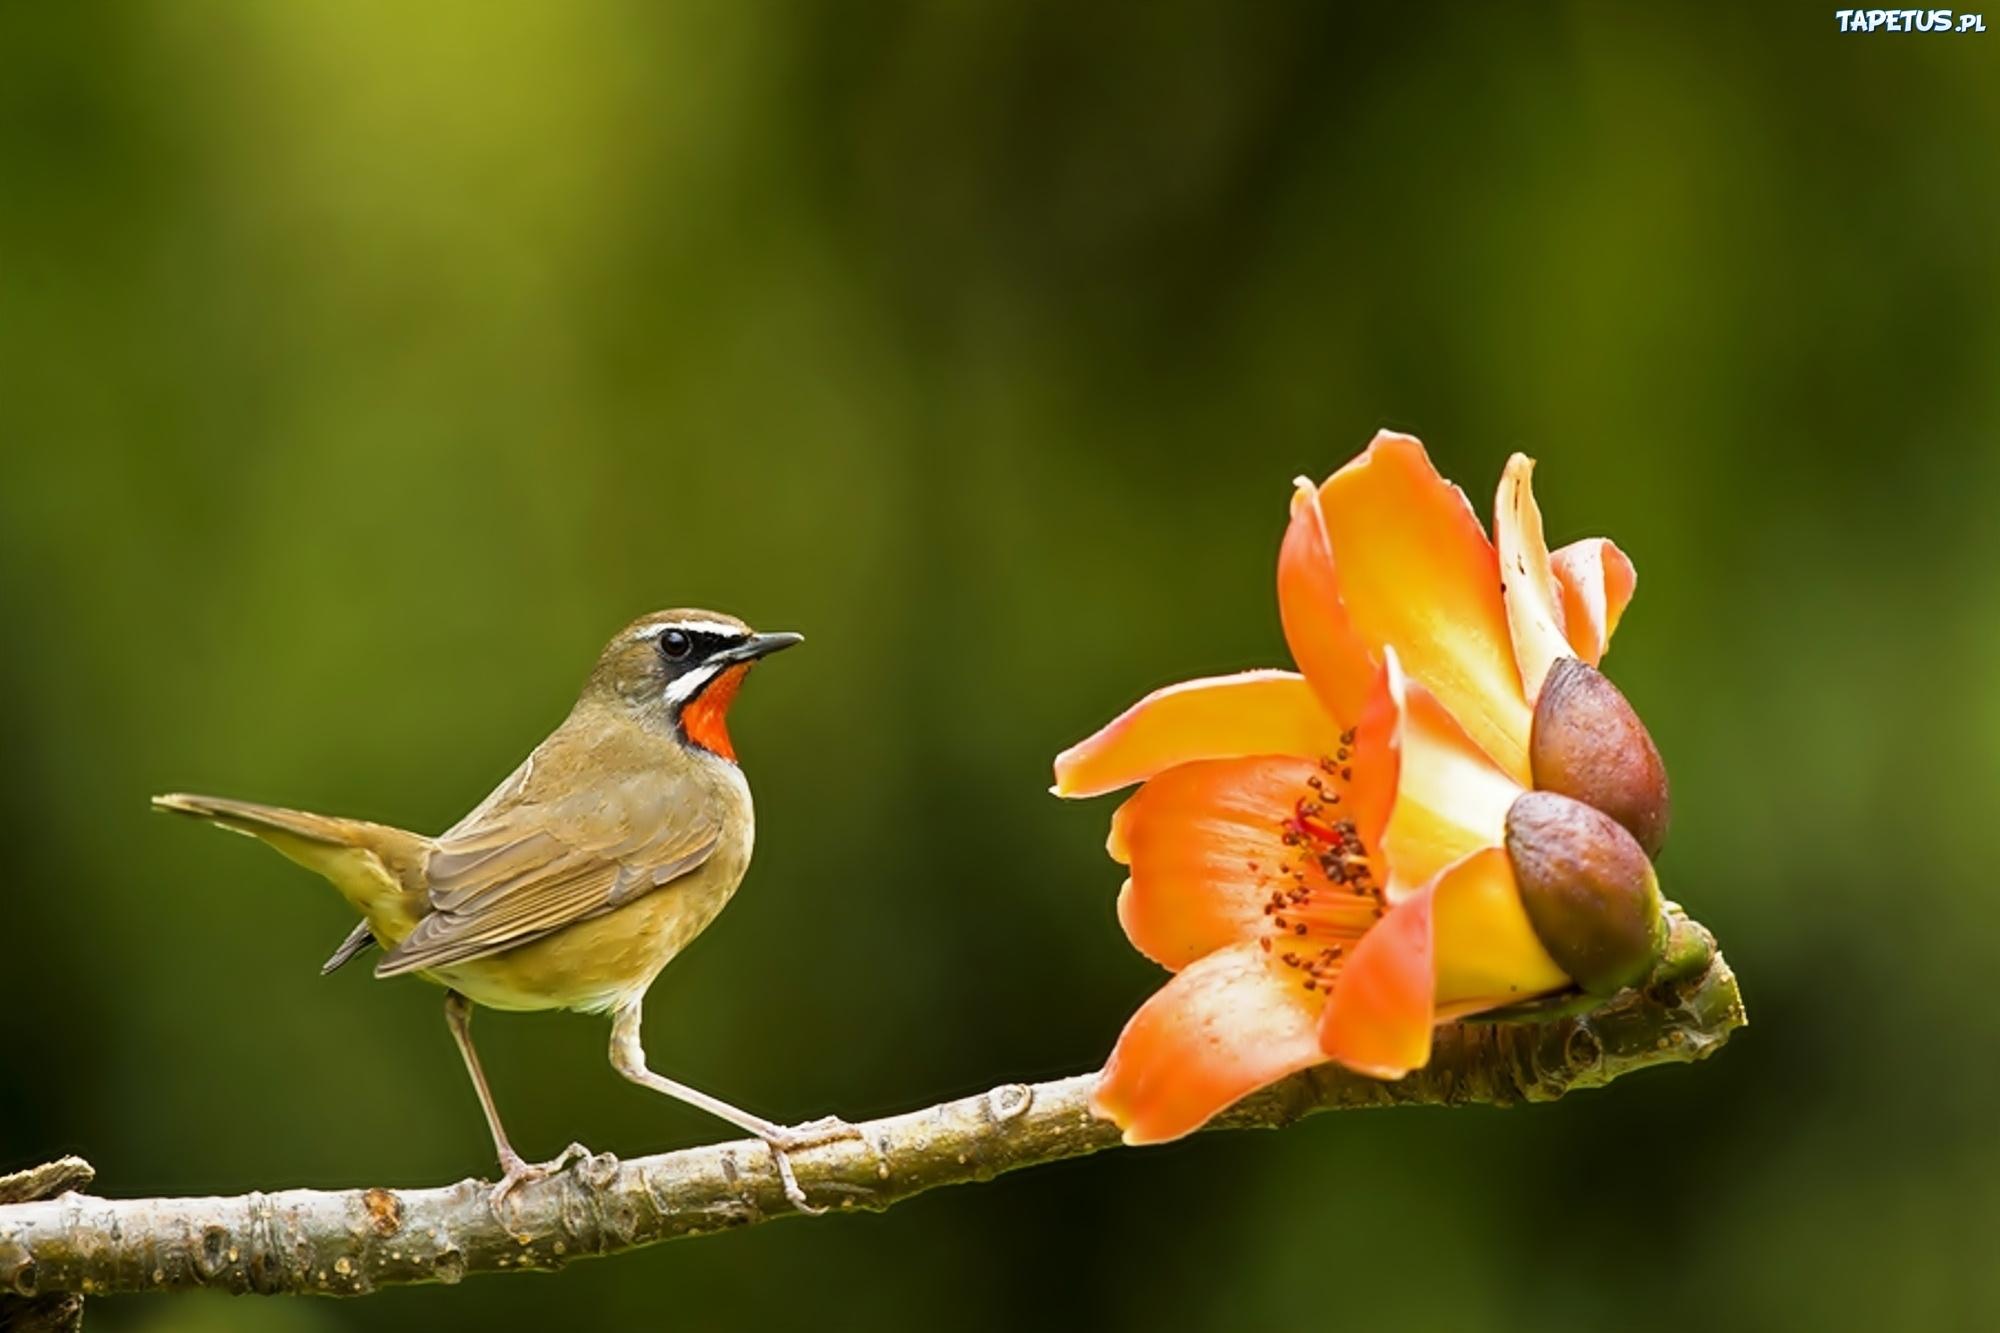 птица цветок  № 2034083 загрузить